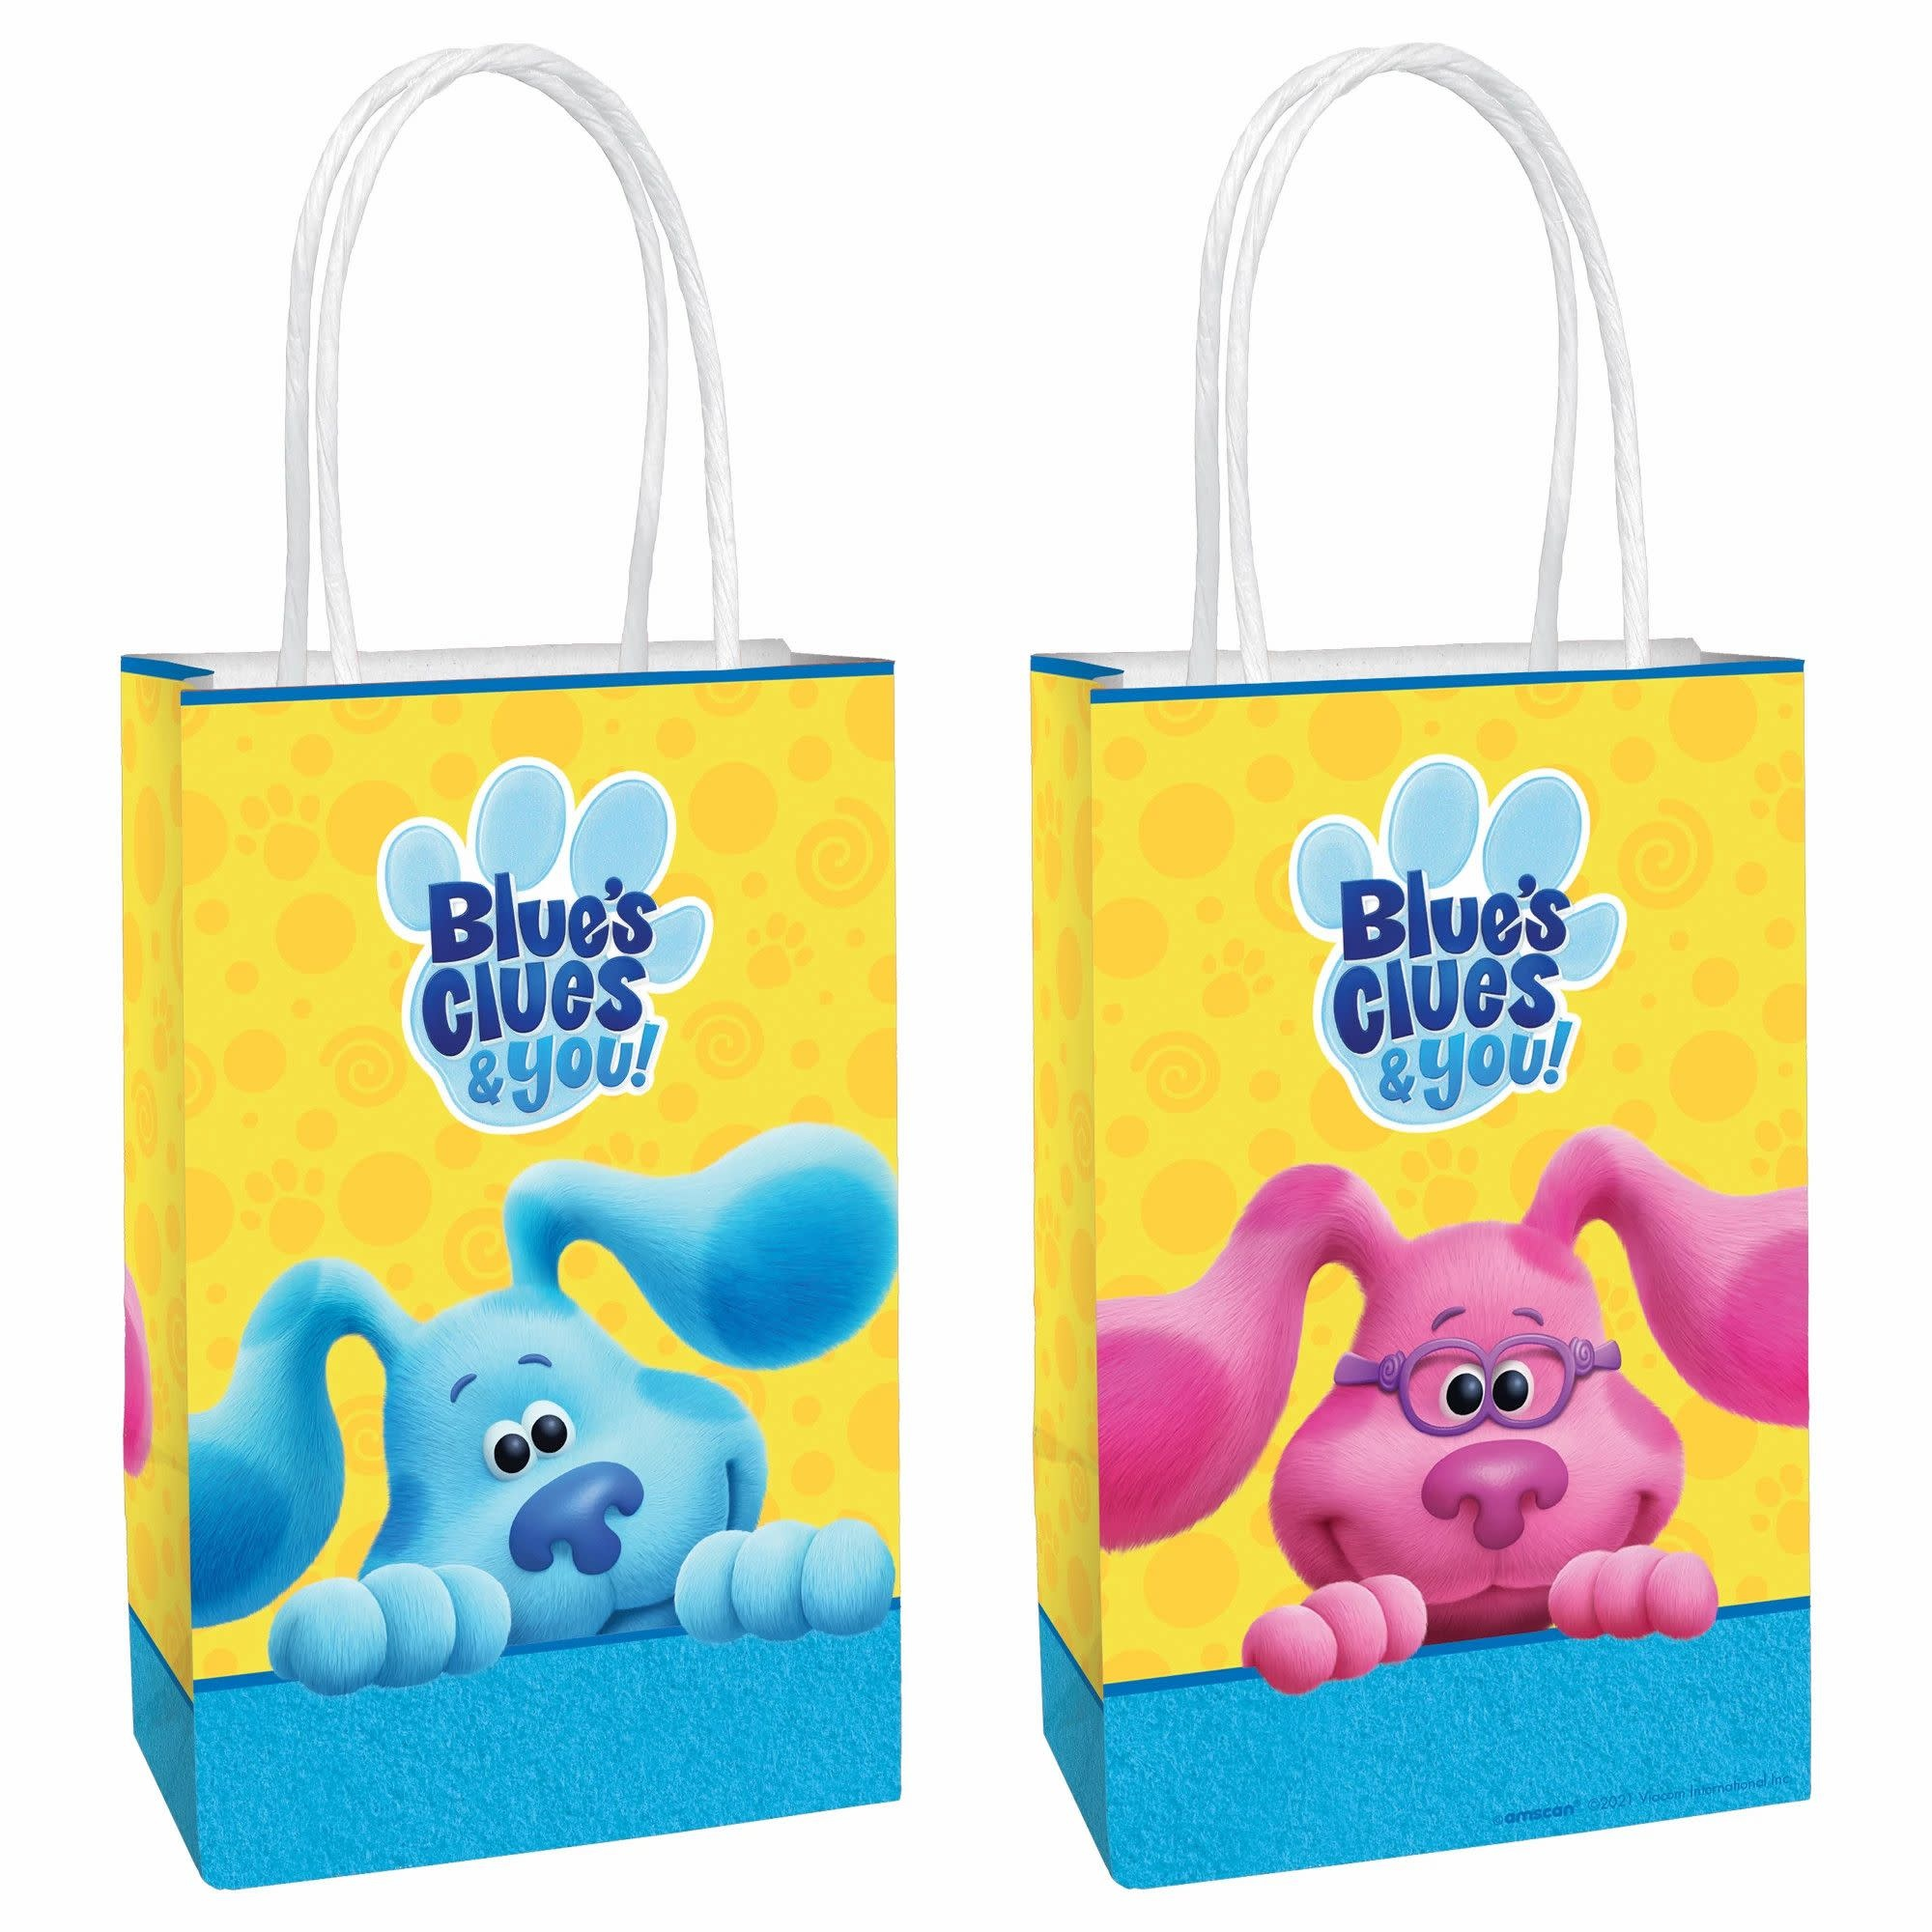 Blues Clues Printed Paper Kraft Bags